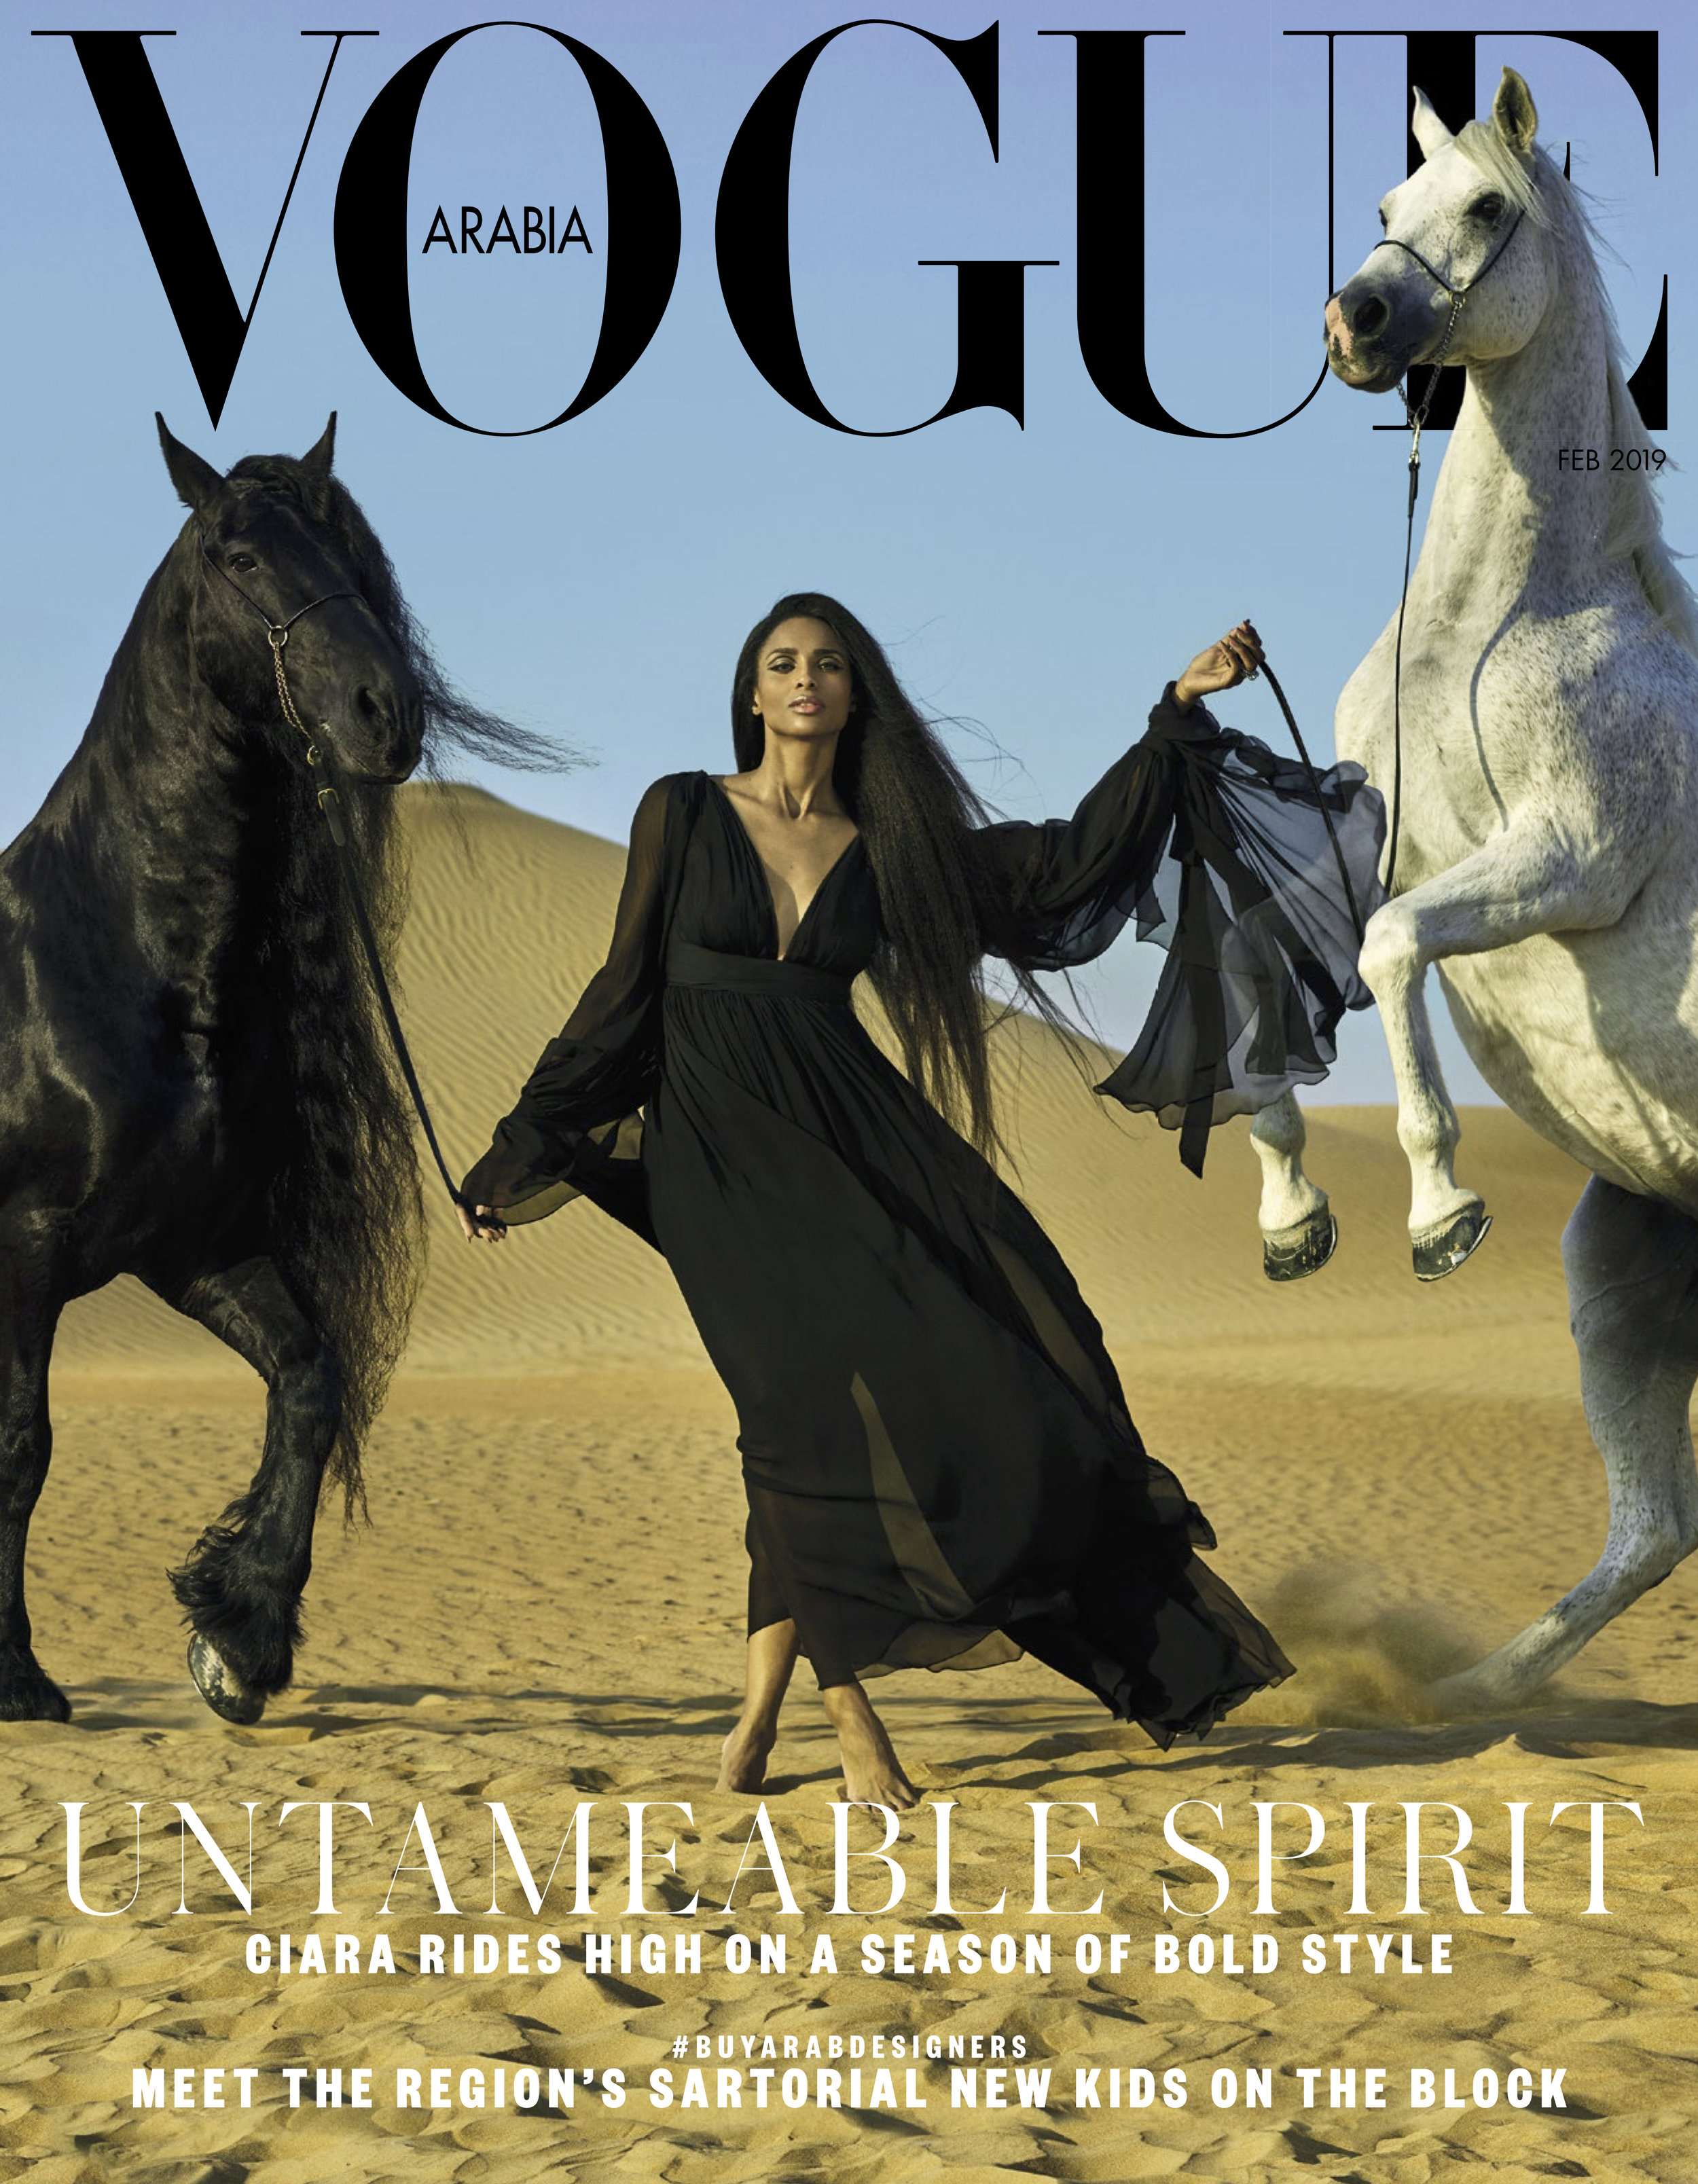 Ciara x Vogue Arabia